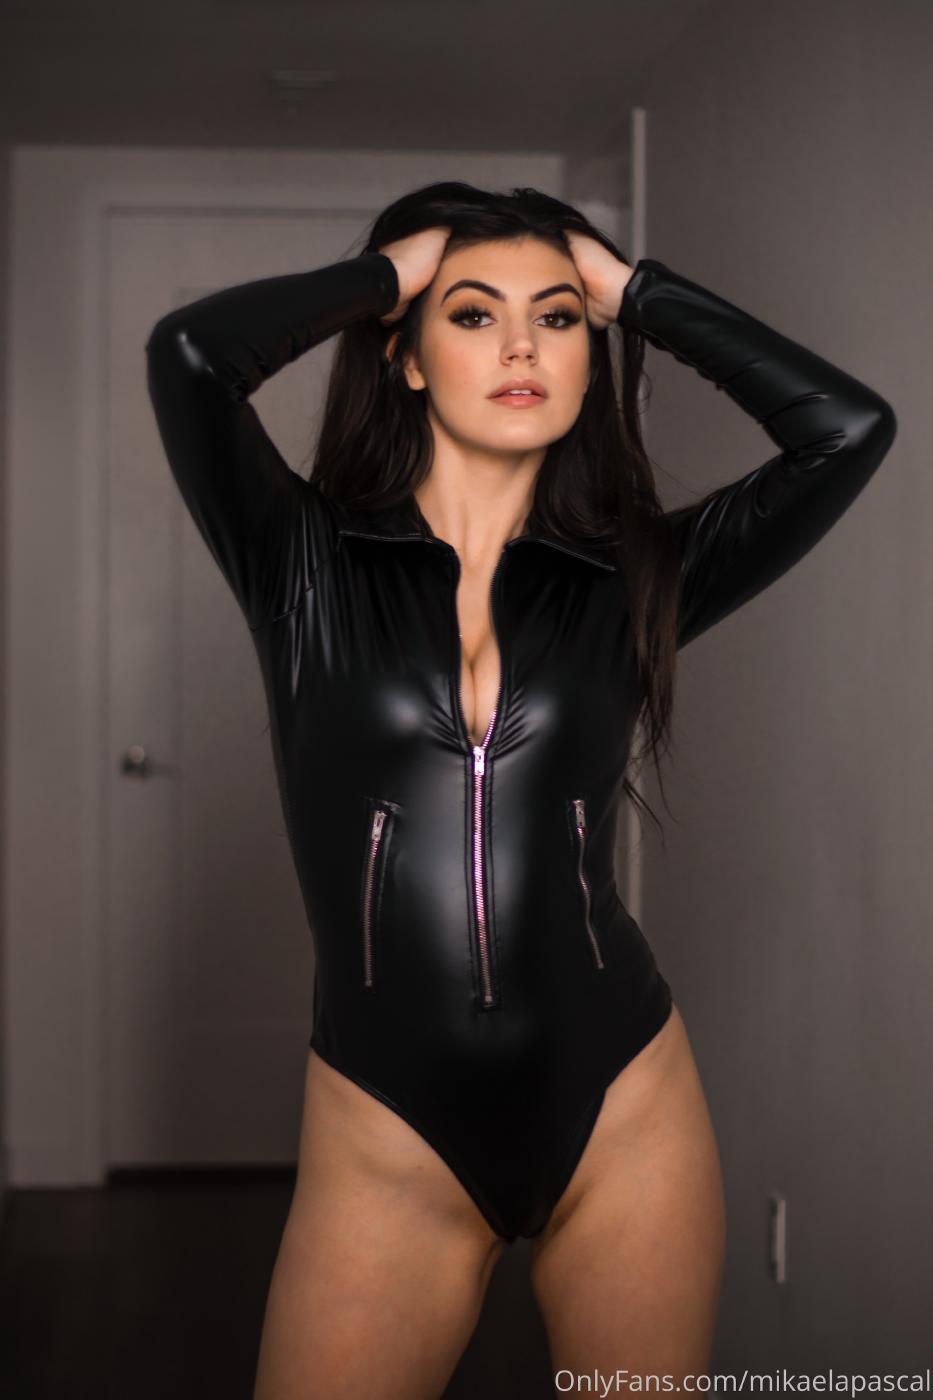 Mikaela Pascal Sexy Leather Bodysuit Onlyfans Set Leaked 0016